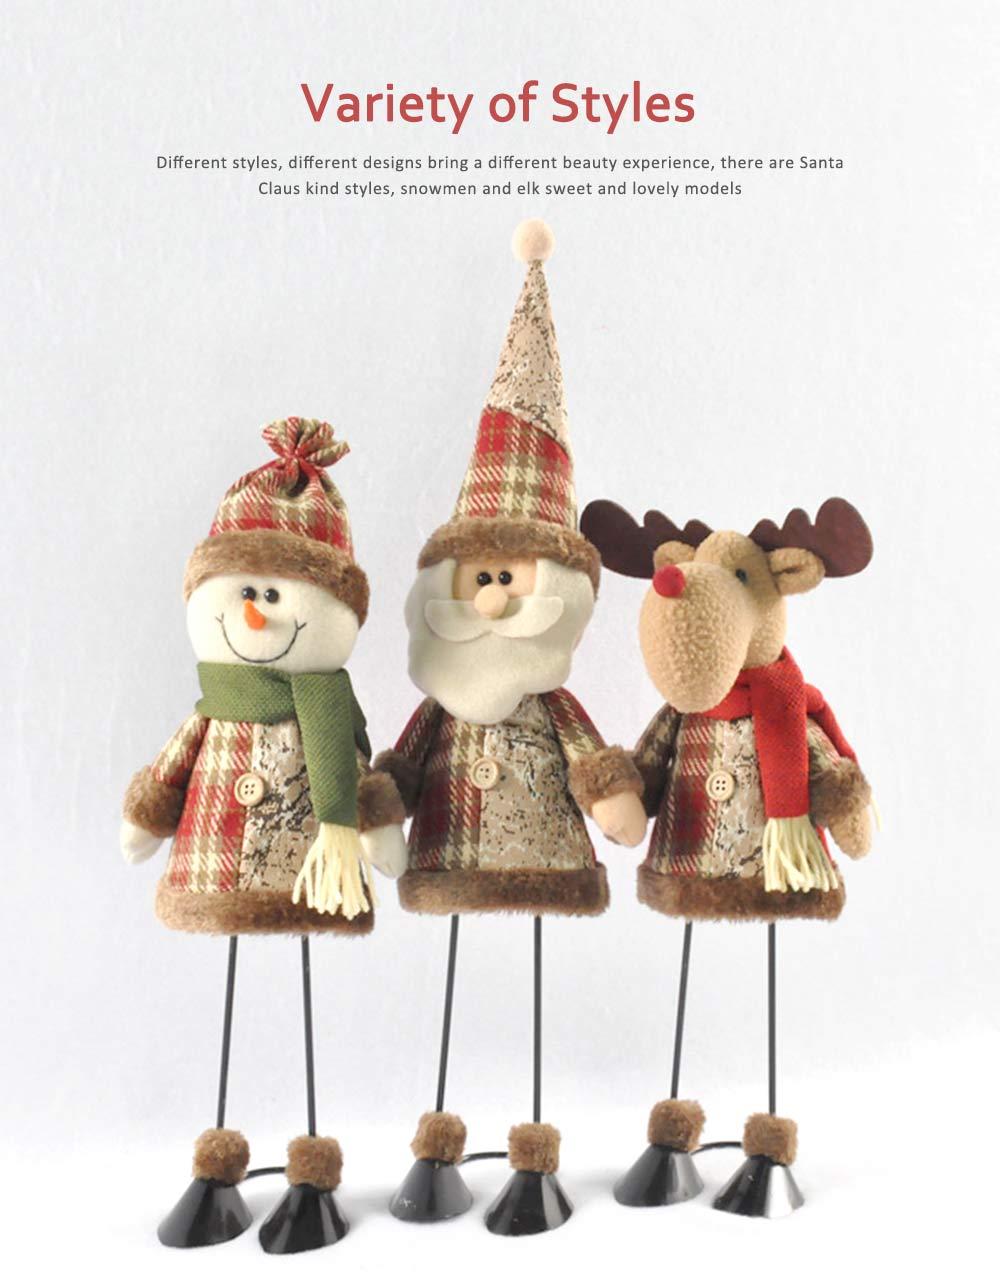 Fabric Santa Claus Figurine, Iron Feet Standing Santa Claus Ornaments 3